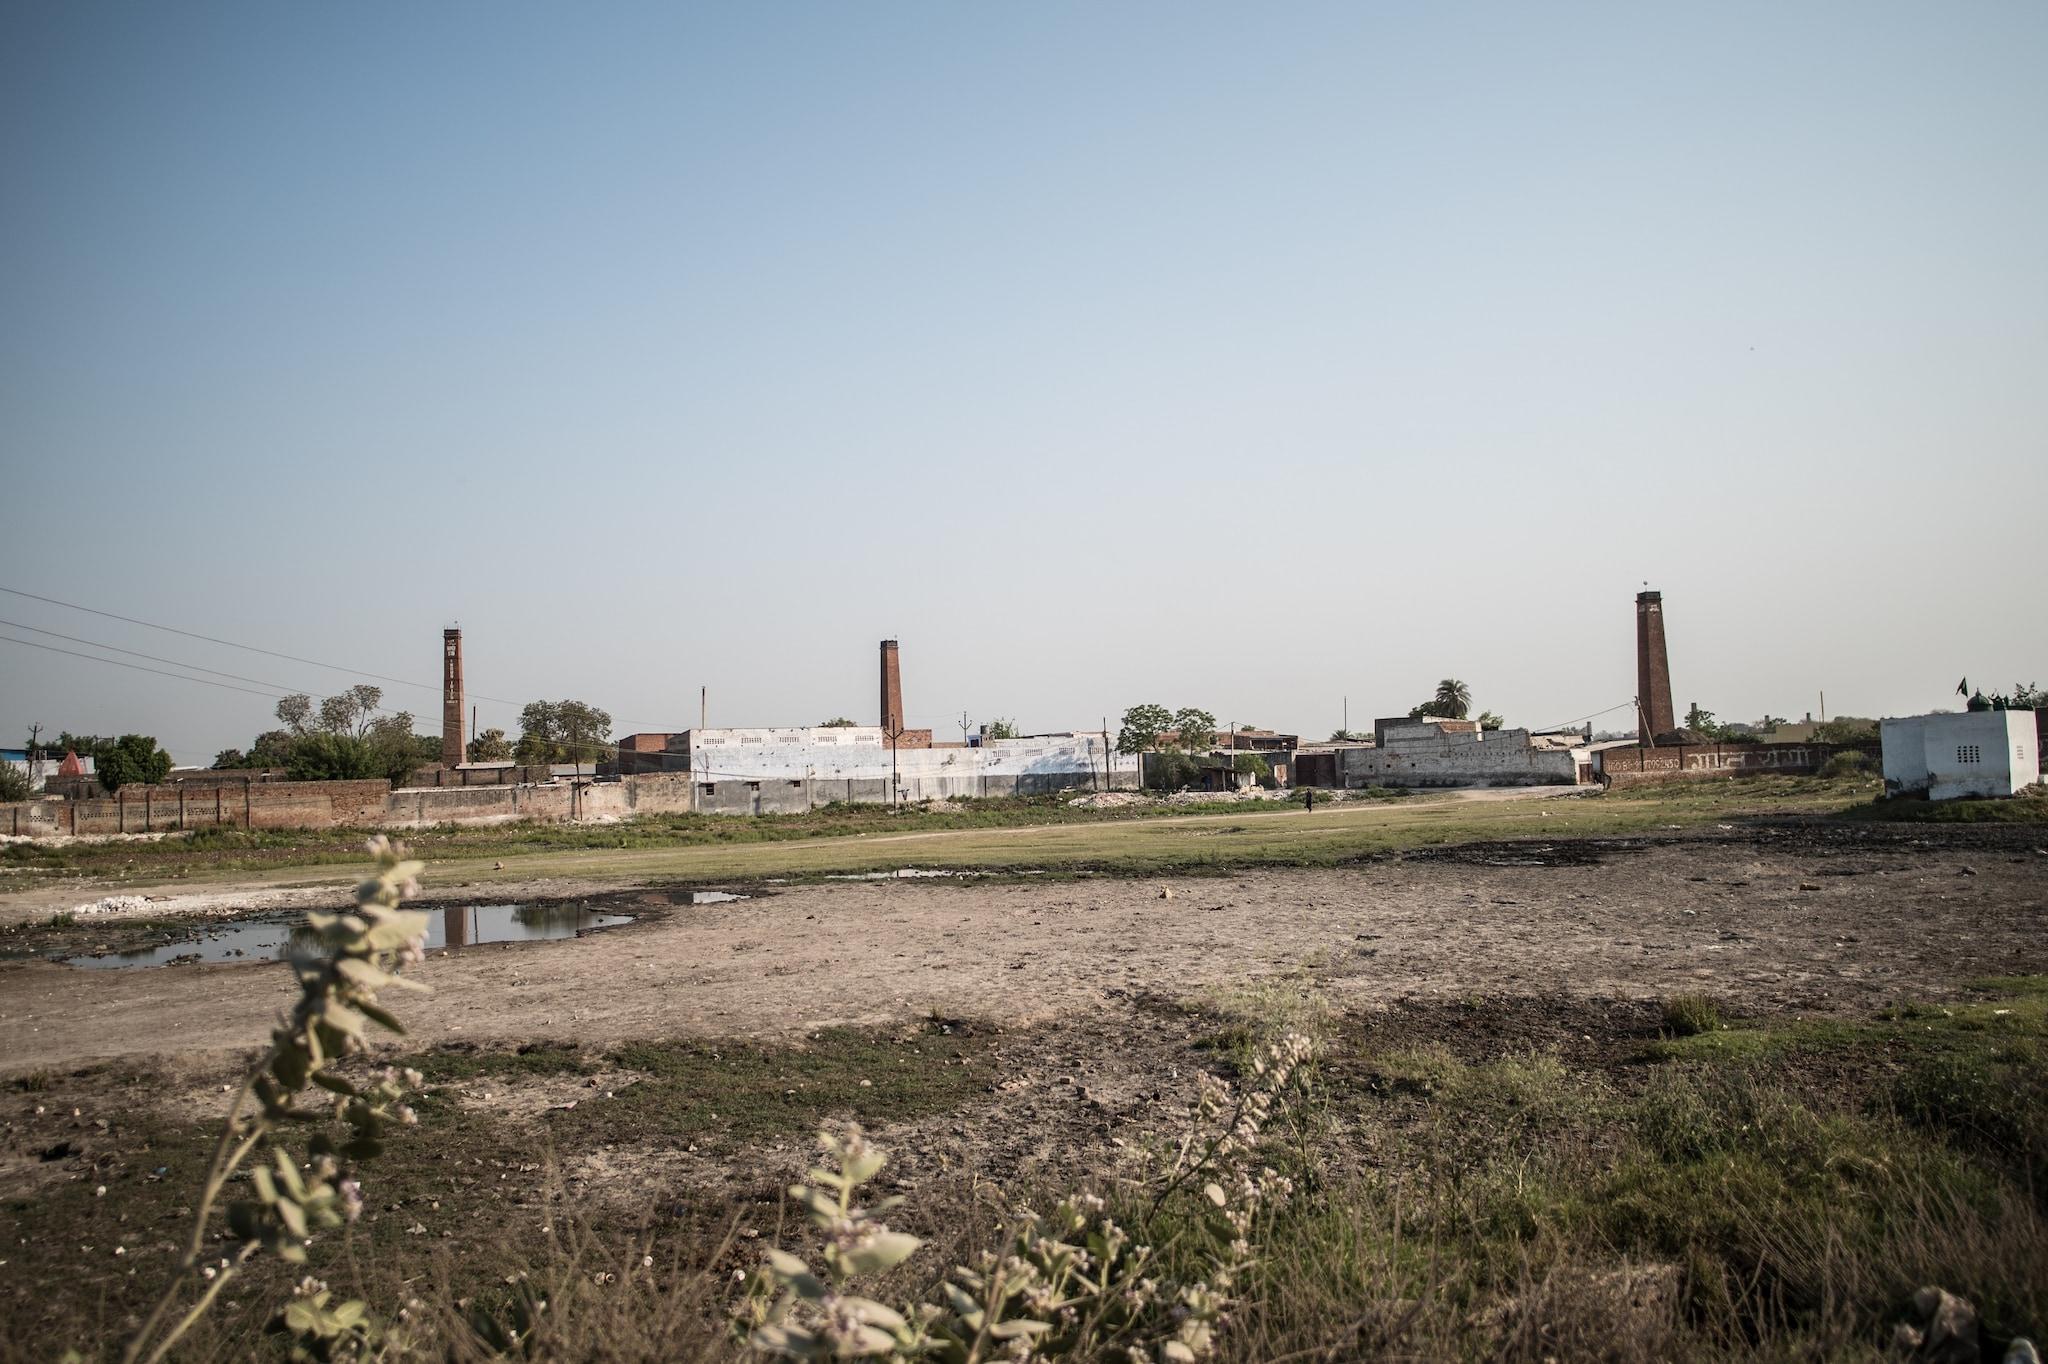 Coal-fired chimneys of yesteryear still stand tall in Khurja